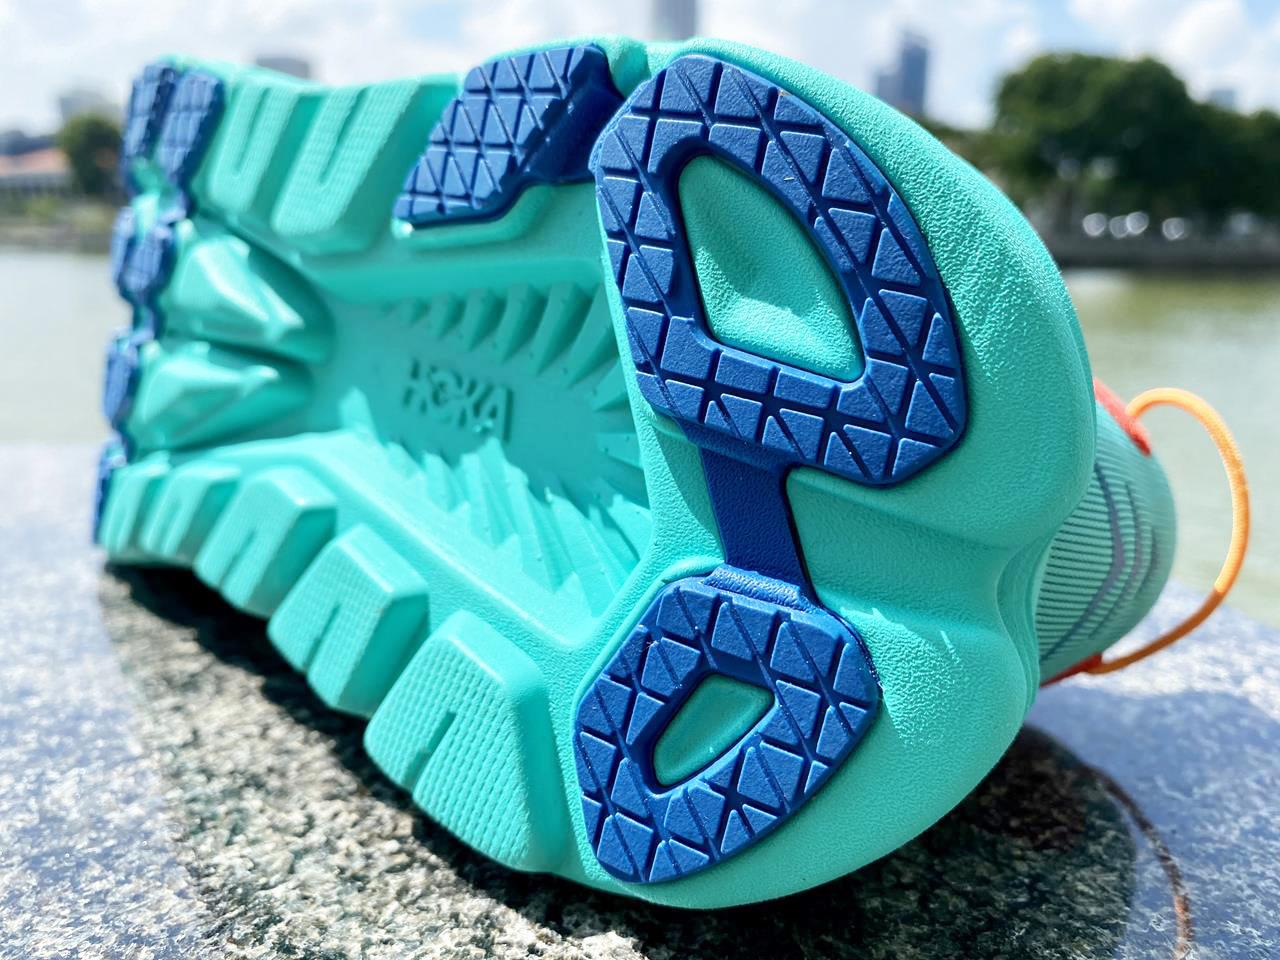 Hoka One One Rincon 3 - Sole Heel